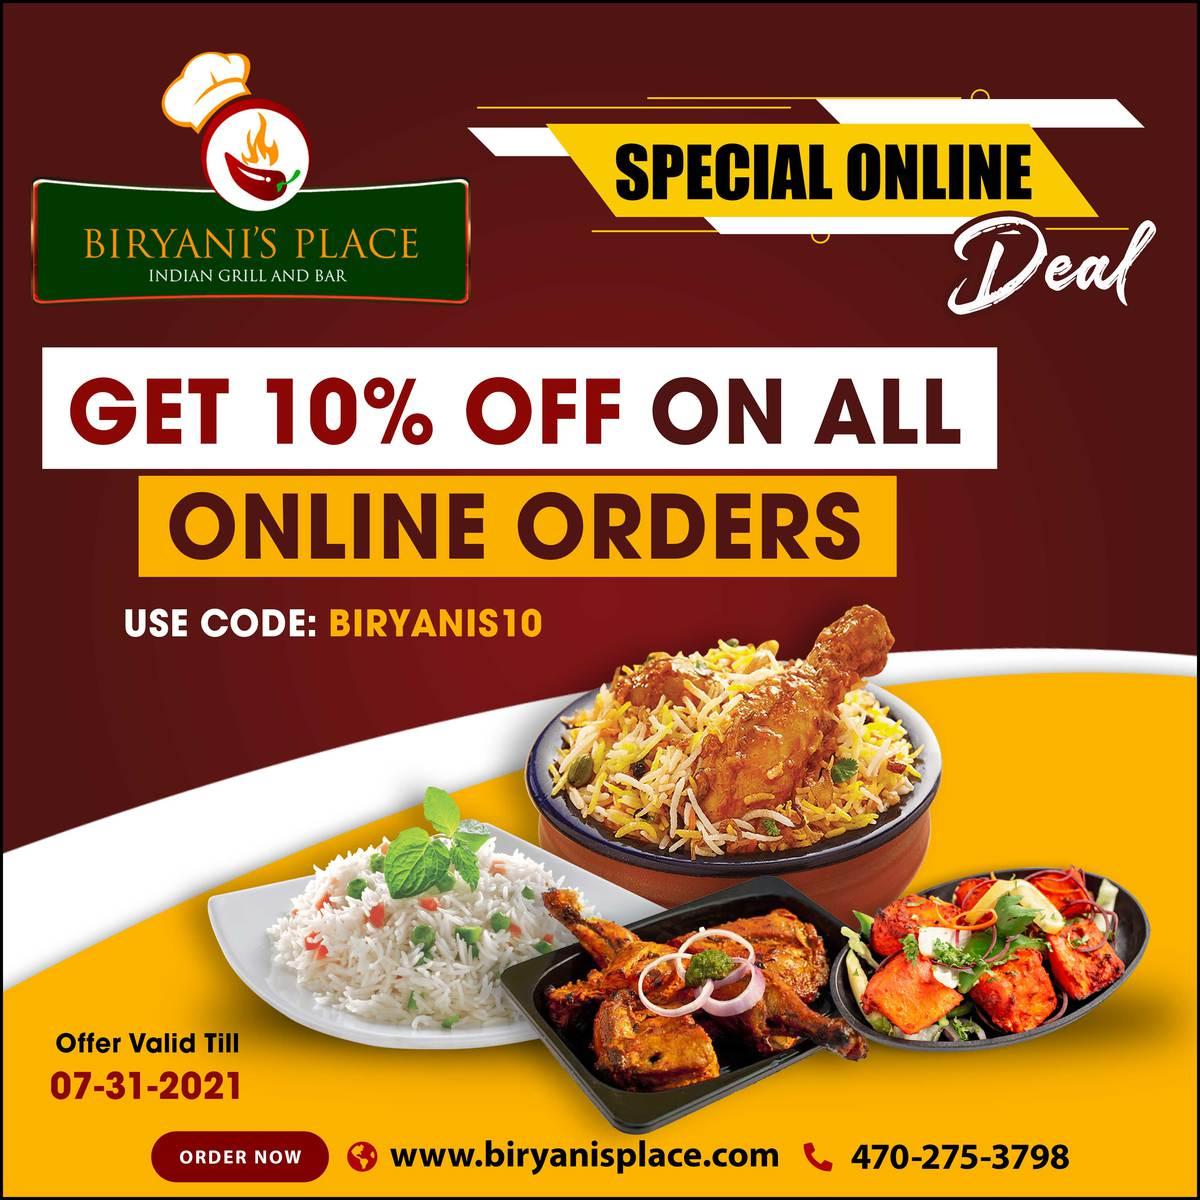 Special Online Deal